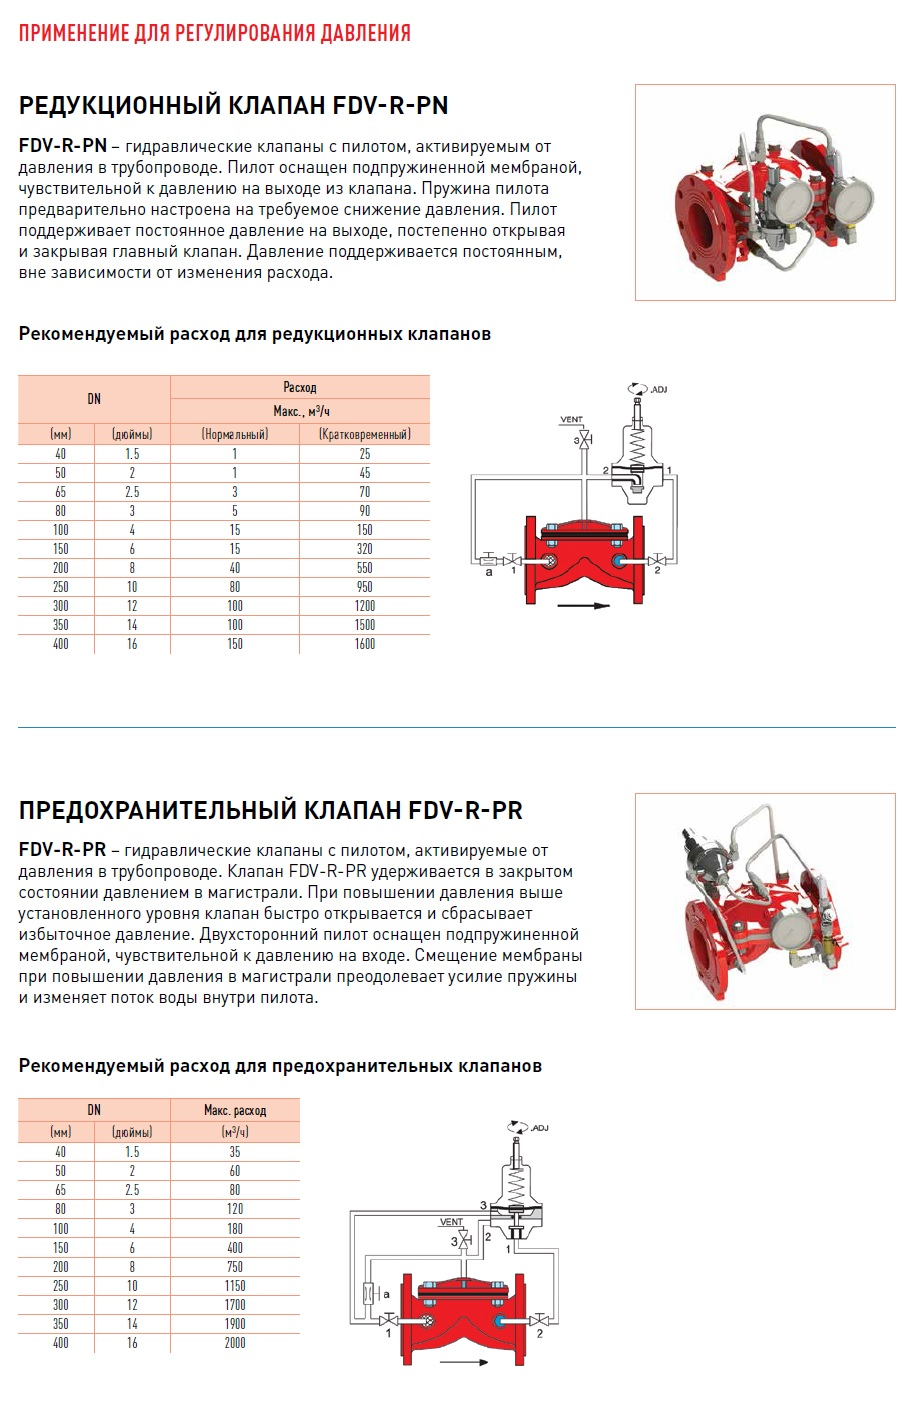 fdv-r raphael 5.jpg